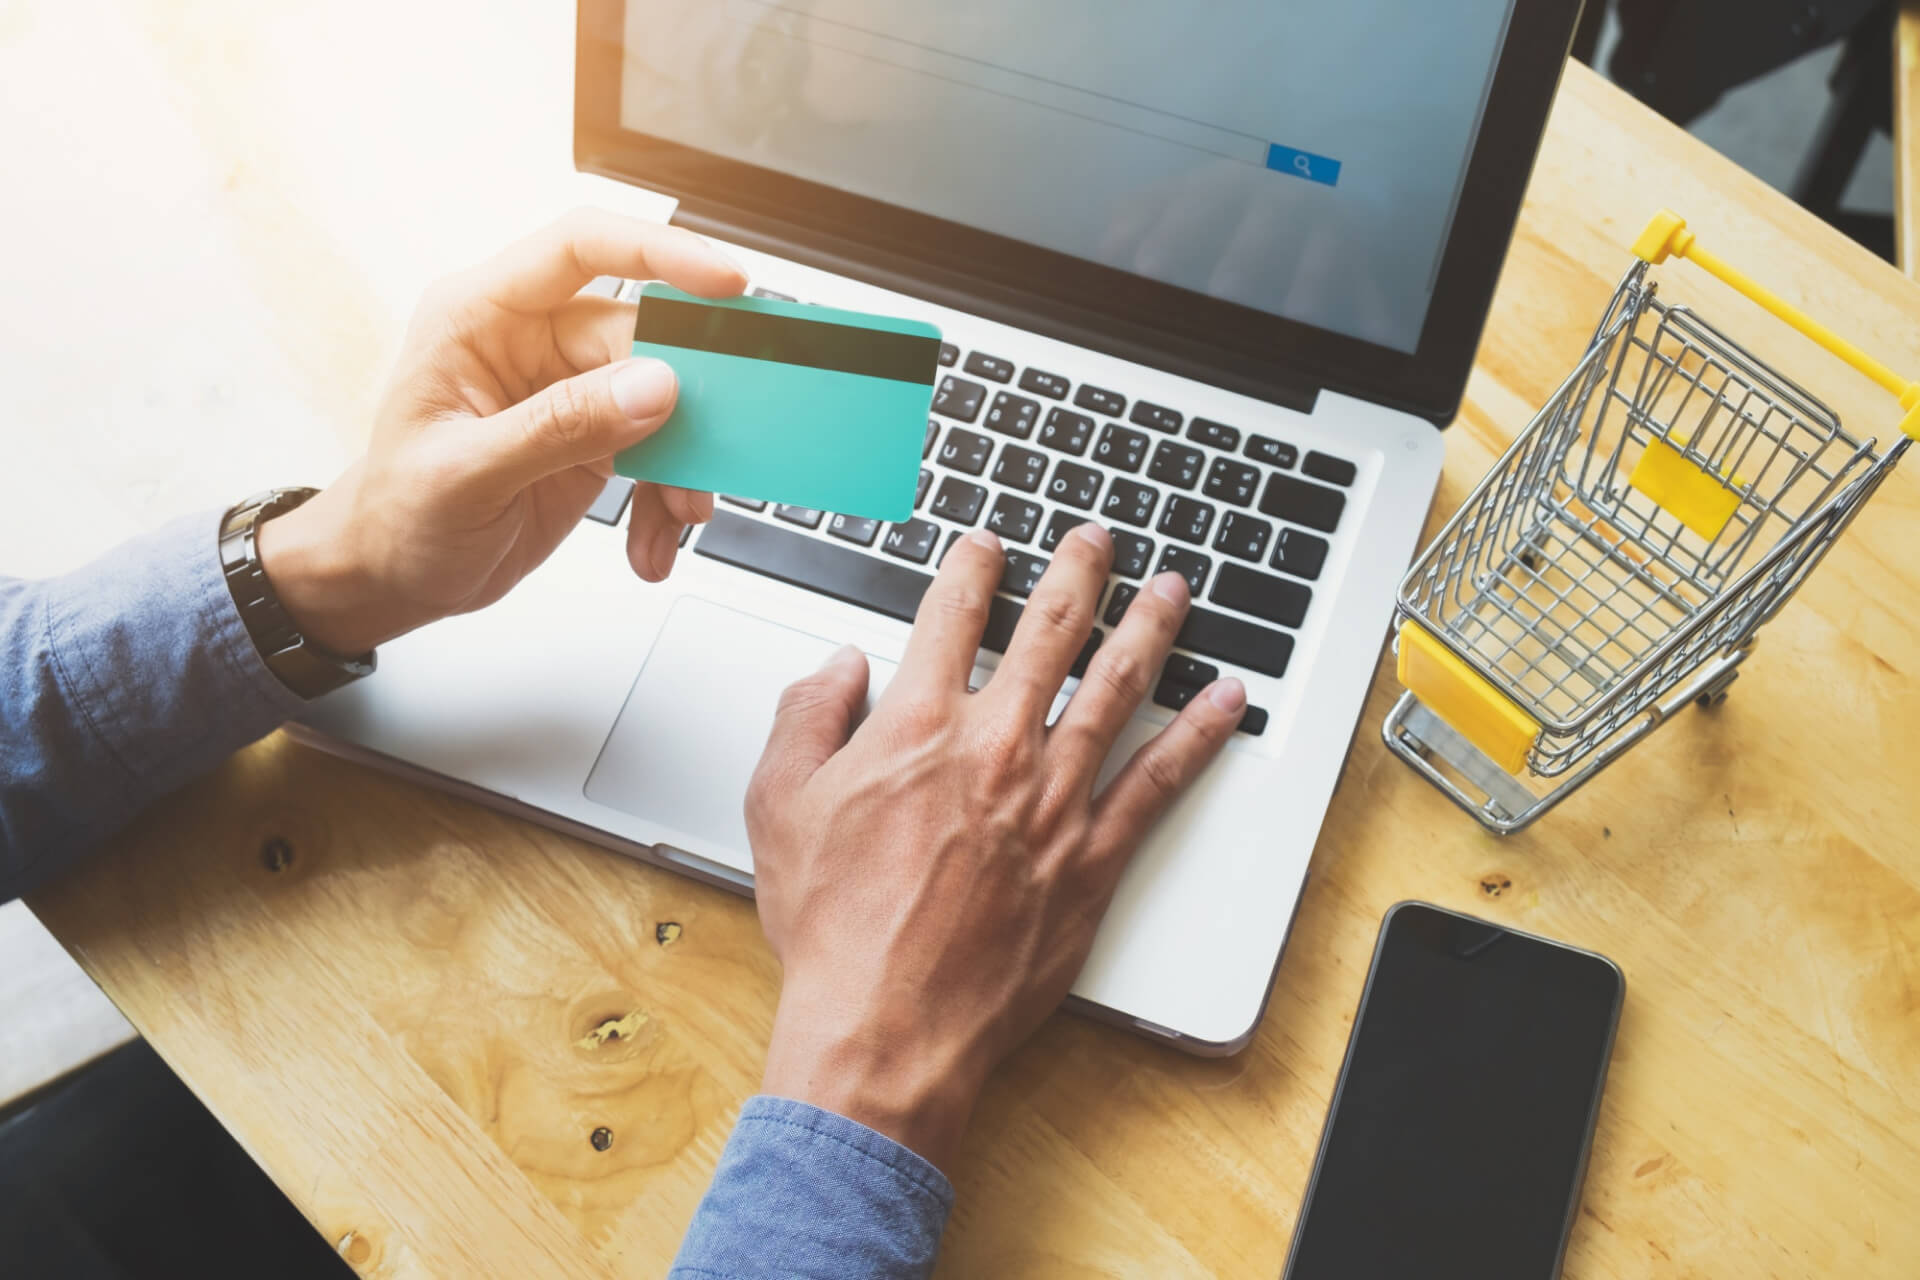 Шопинг раскинул Сеть. Россияне нарастили онлайн-покупки в 2,3 раза за год